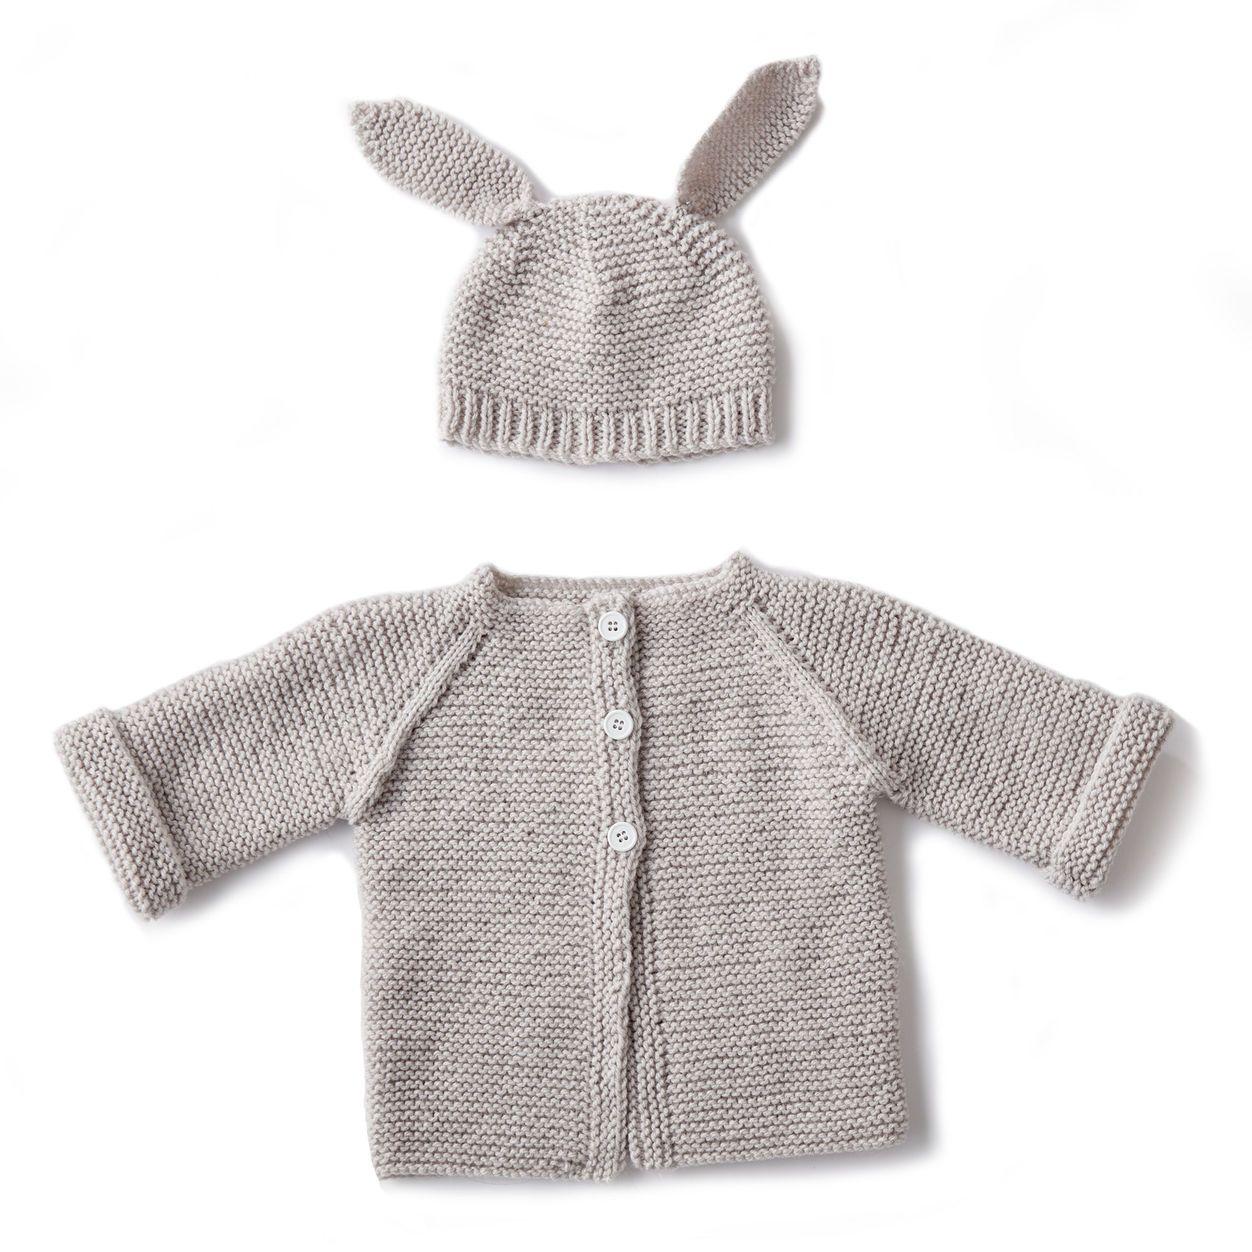 Bernat Knit Baby Jacket Set, Newborn   Free pattern   Pinterest ...